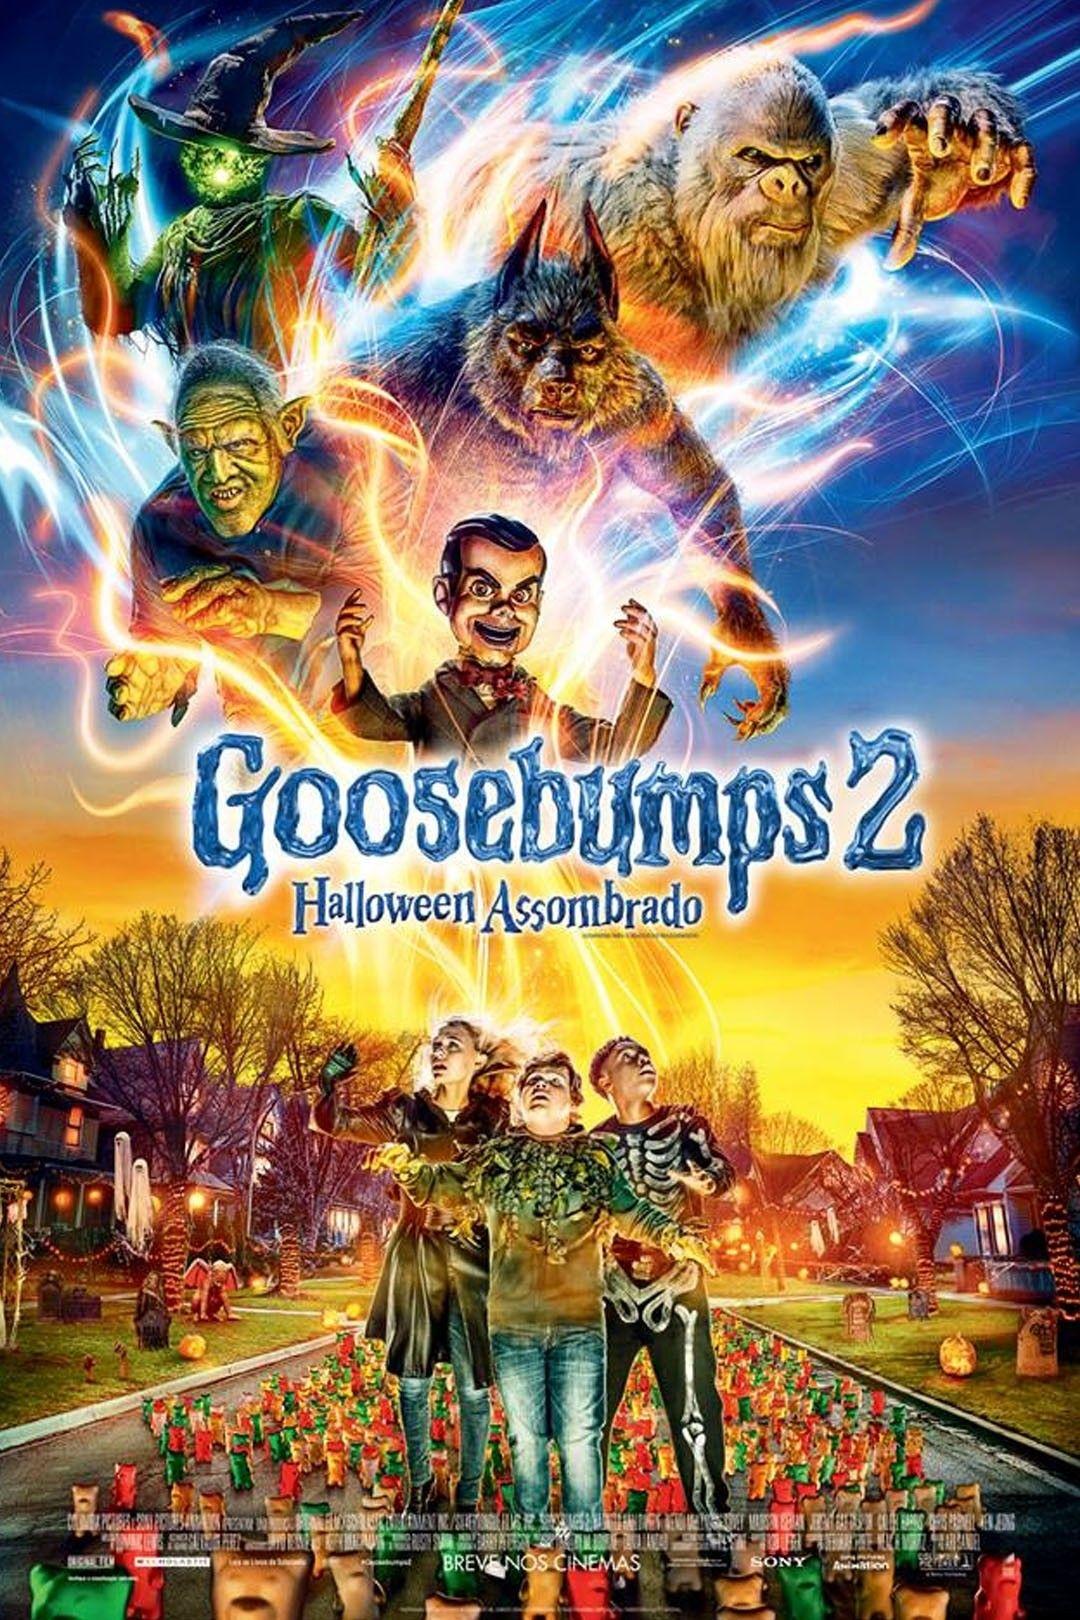 Goosebumps 2 Halloween Assombrado With Images Halloween Full